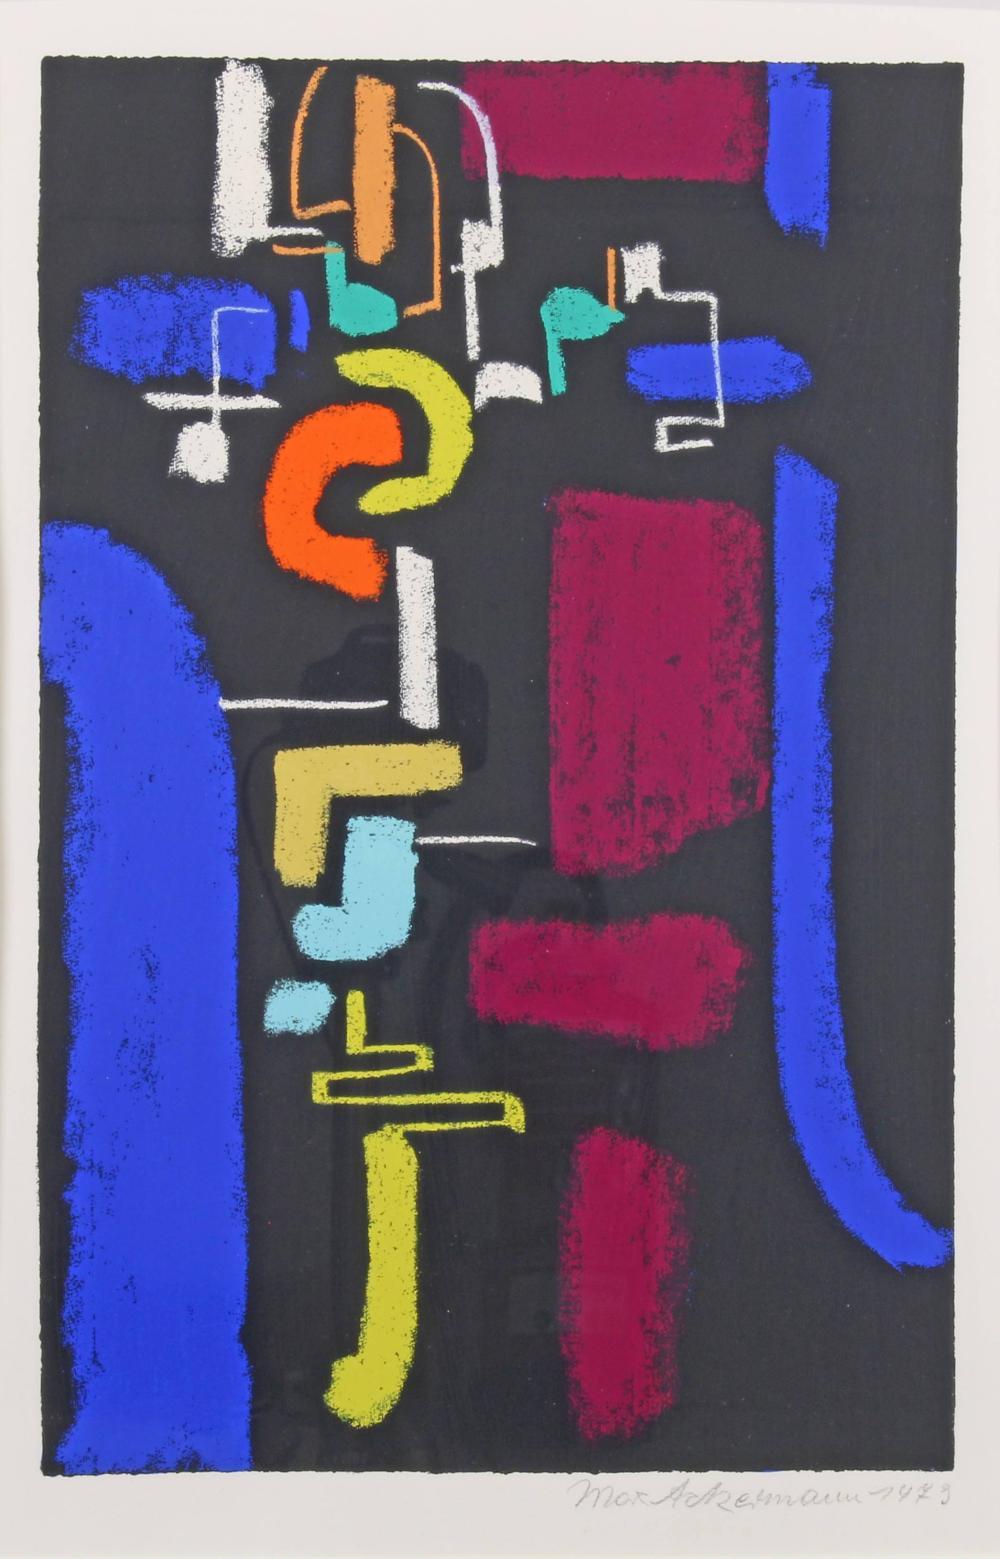 Ackermann, Max (1887 Berlin - 1975 Stuttgart, Studium an der Kunstschule in Weimar bei Henry van den Velde, an der KA Dresden, München und Stuttgart bei Adolf Hölzel, Maler und Grafiker),